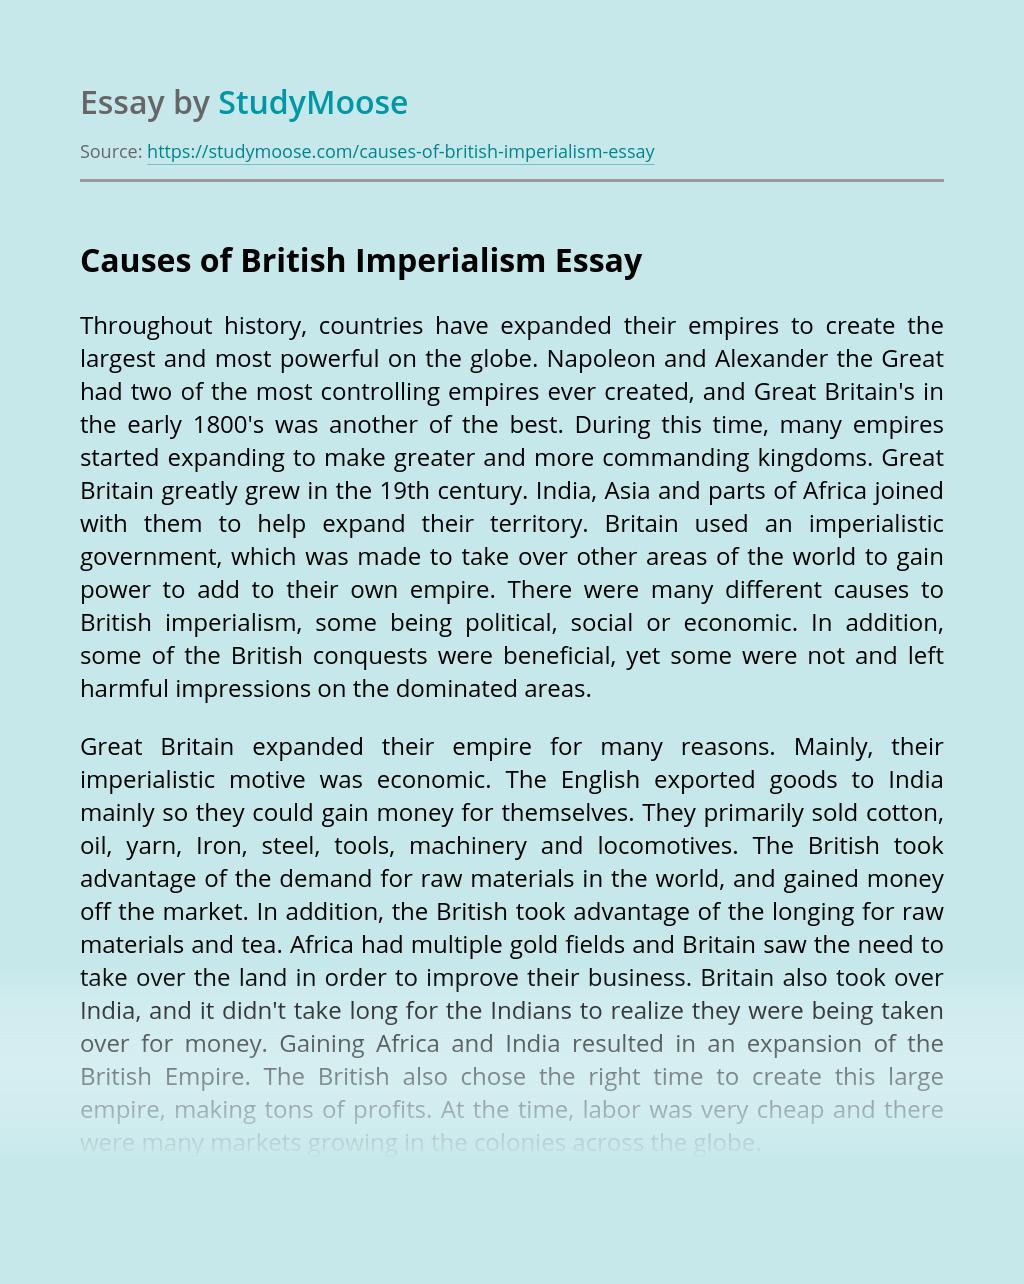 British imperialism in africa essay top presentation proofreading sites au